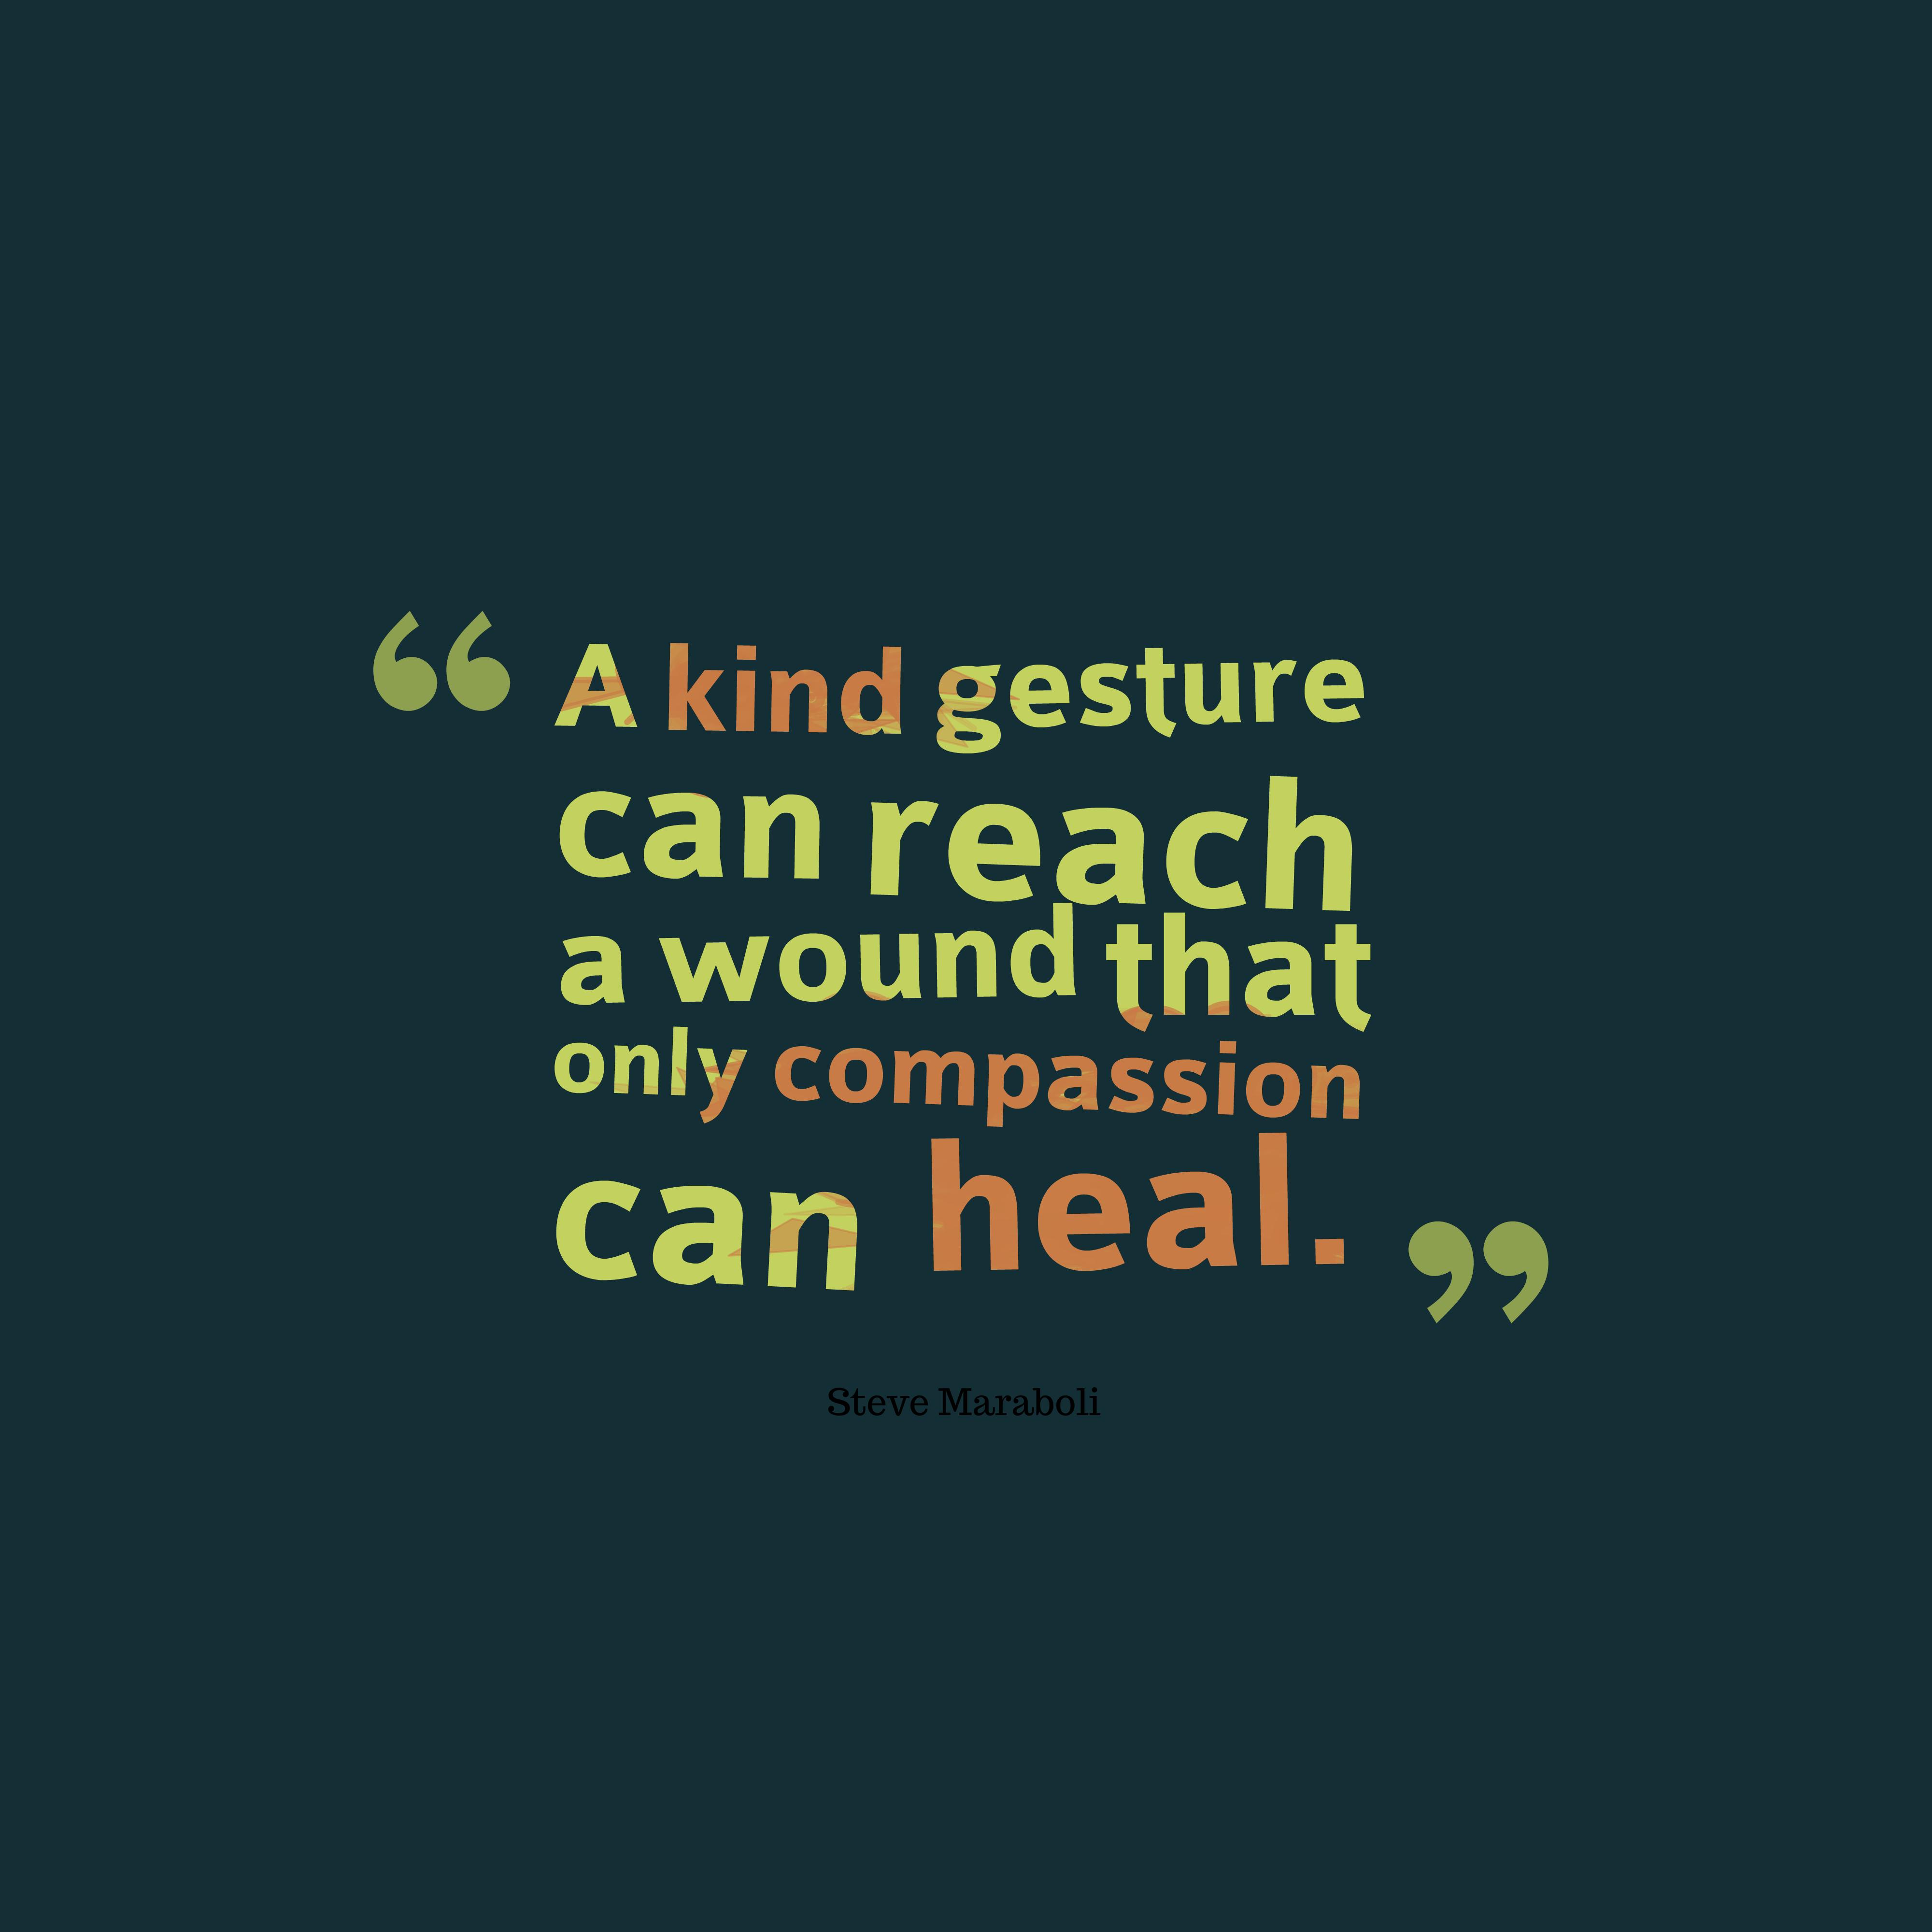 Steve Maraboli quote about compassion. Compassion quotes